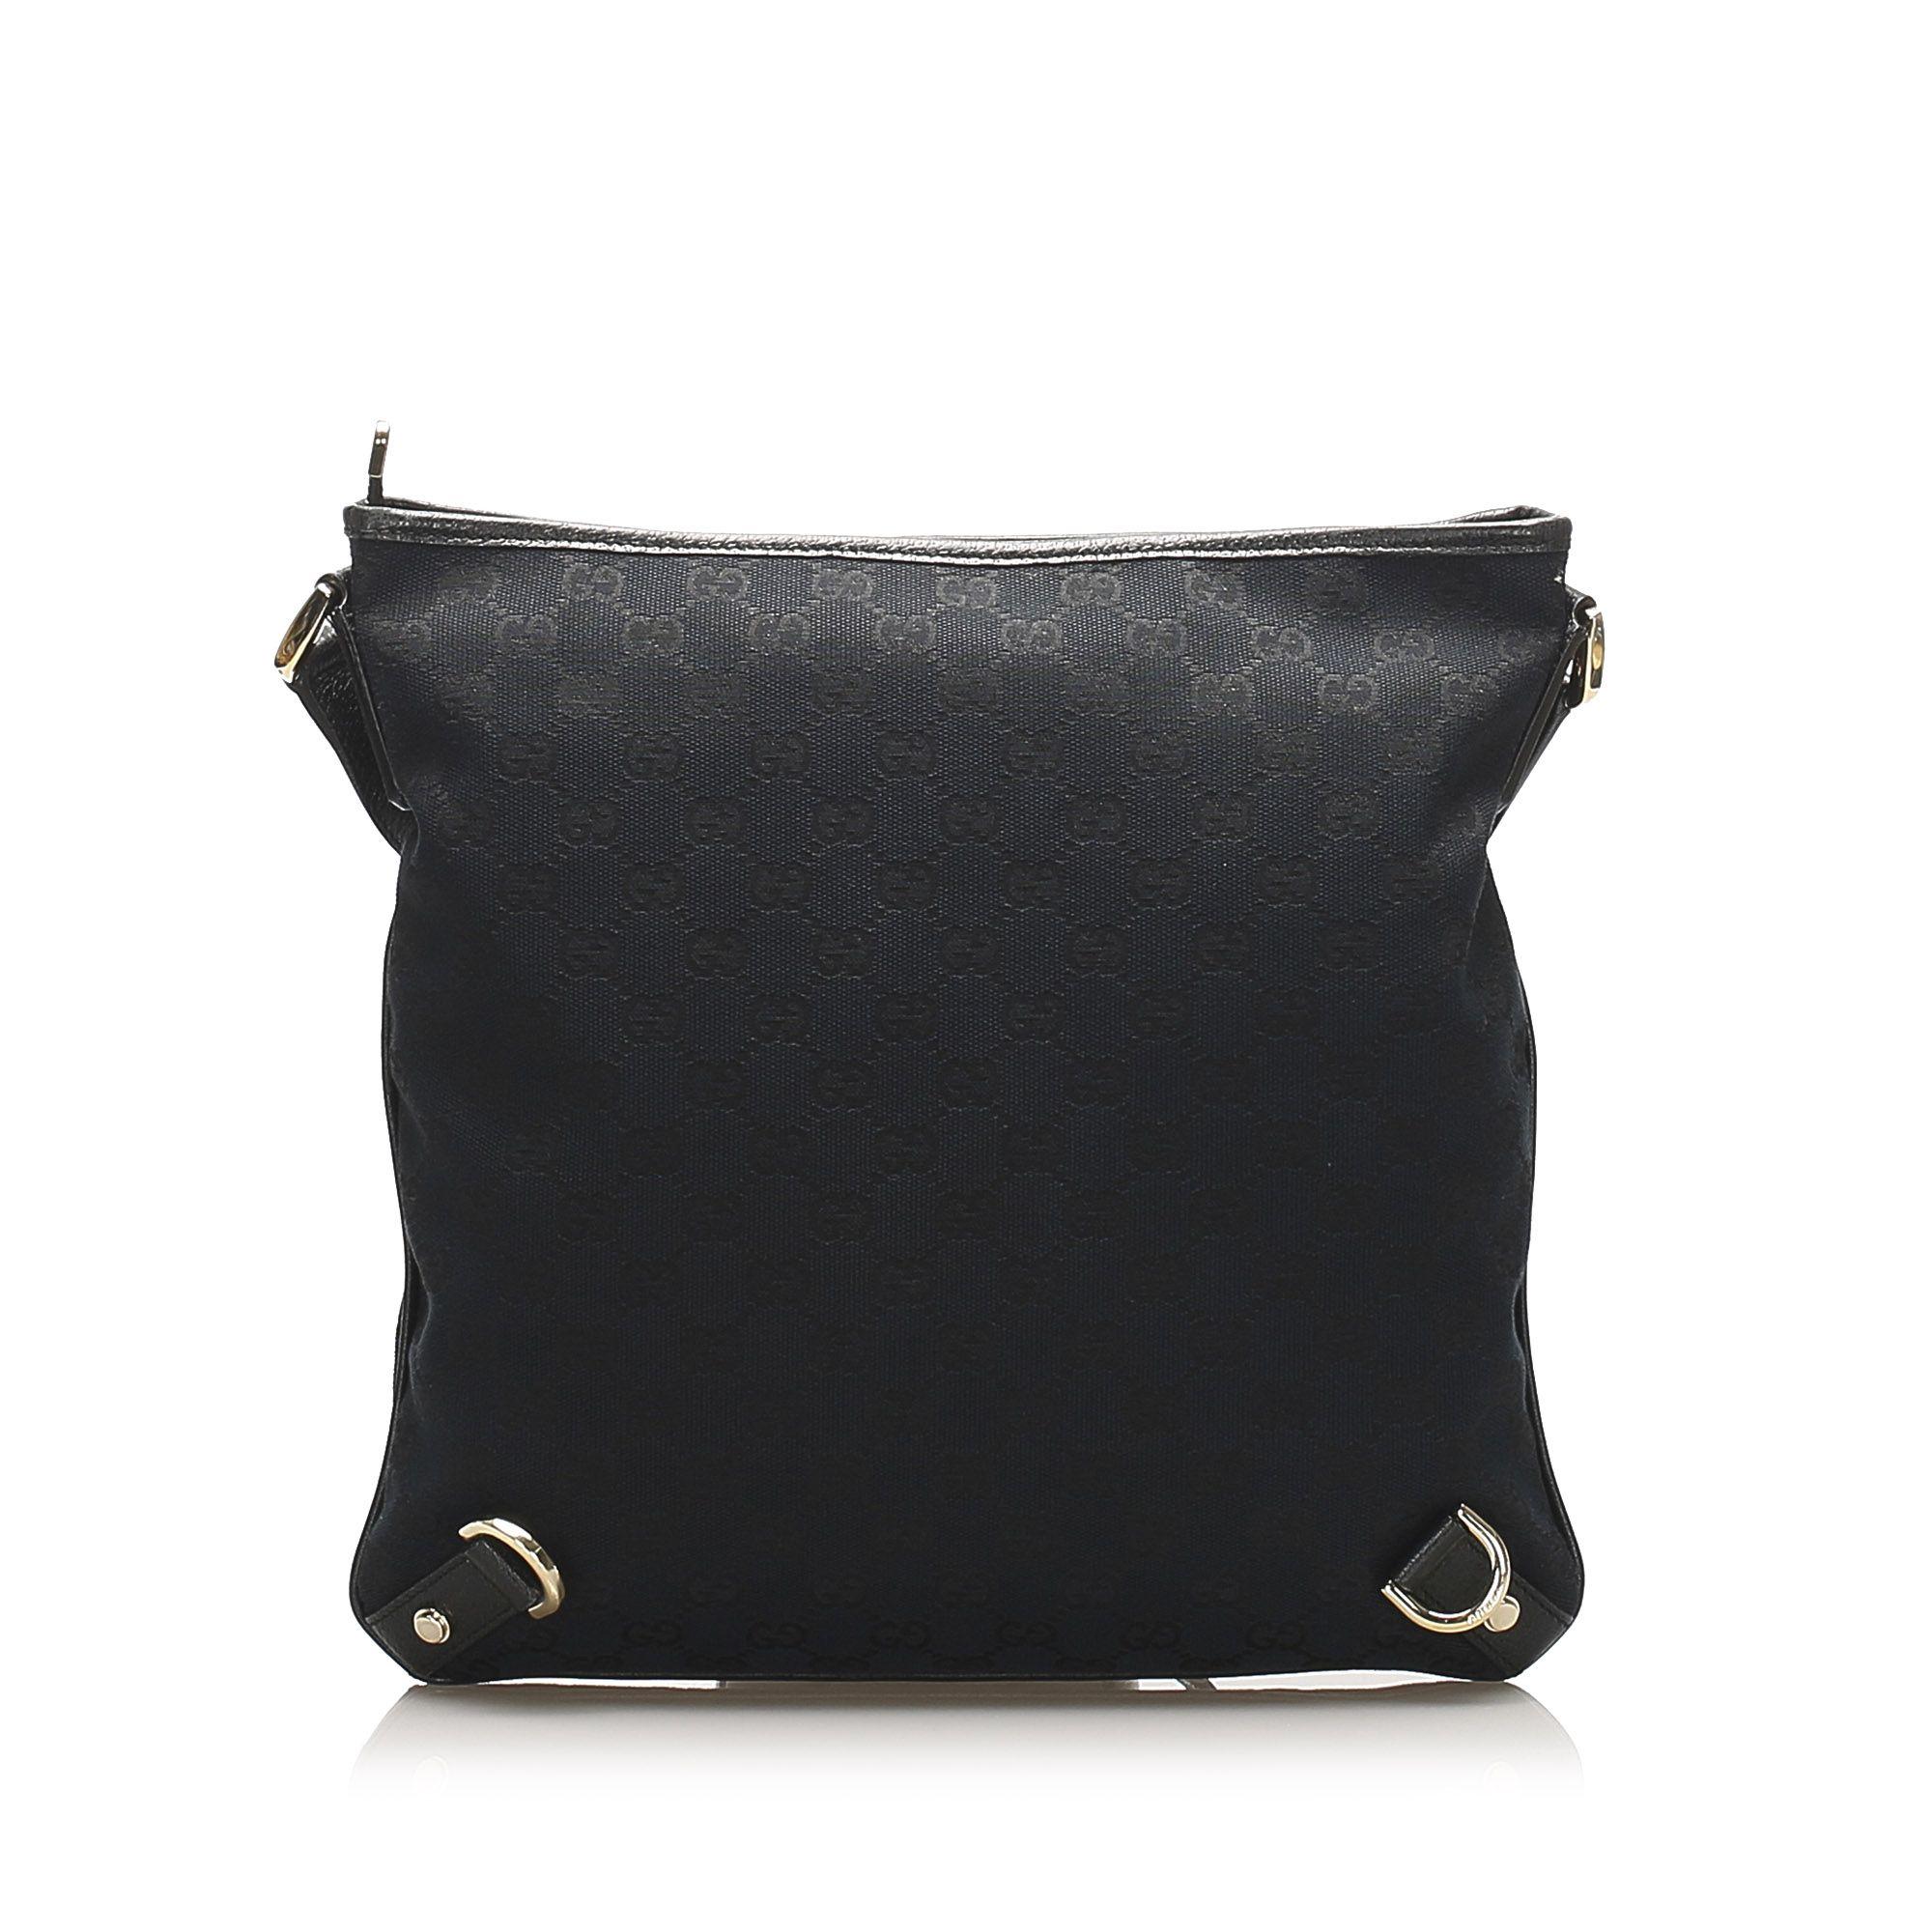 Vintage Gucci GG Canvas Abbey D-Ring Crossbody Bag Black